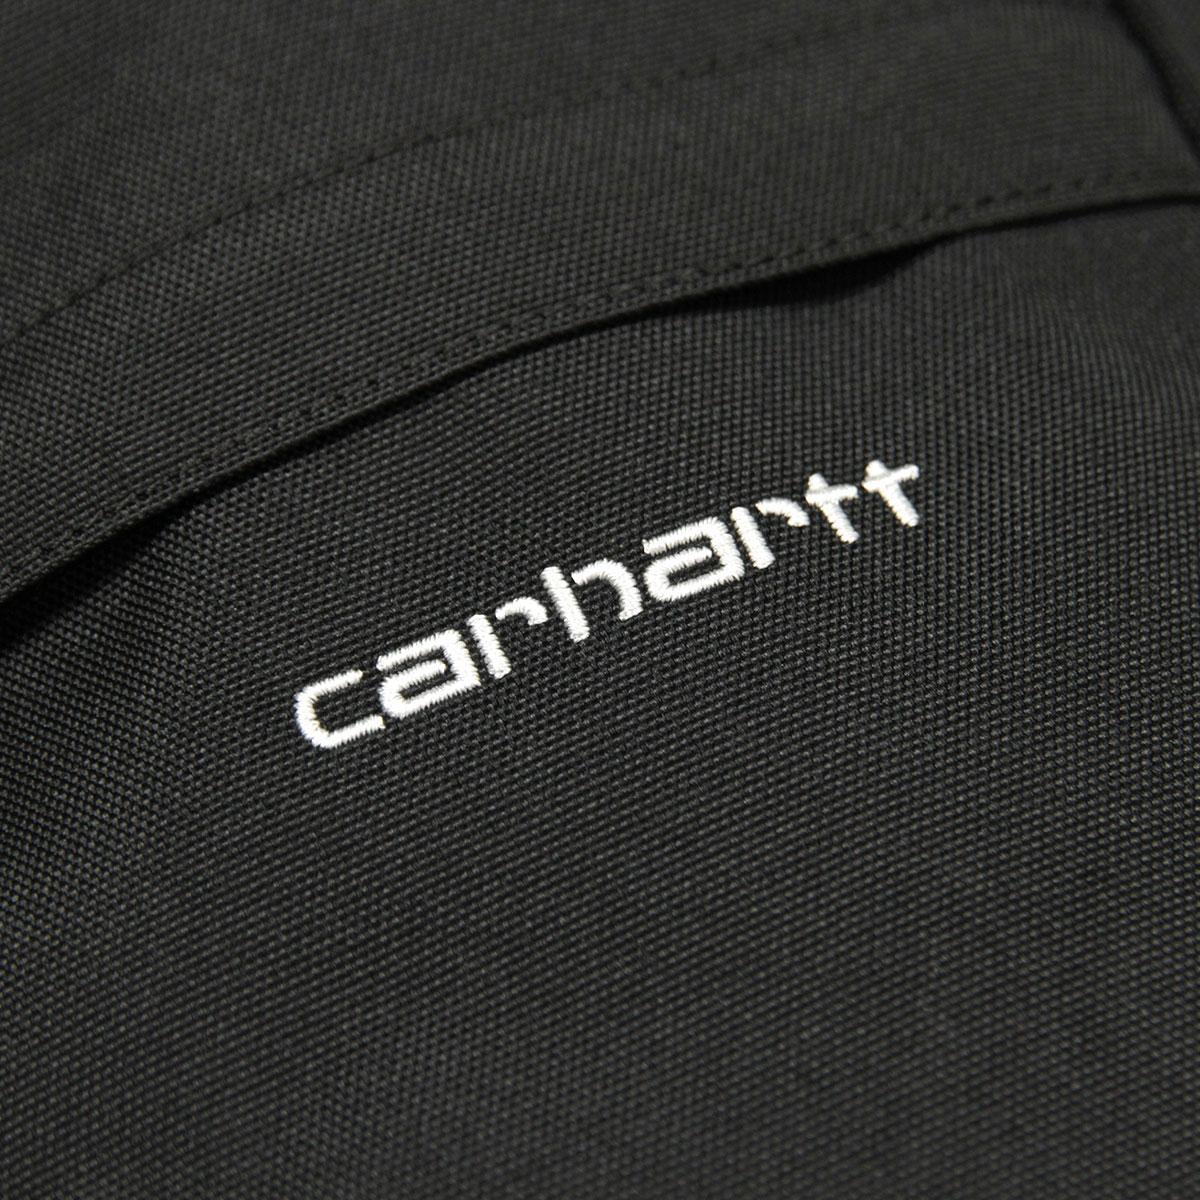 carhartt_wip_1